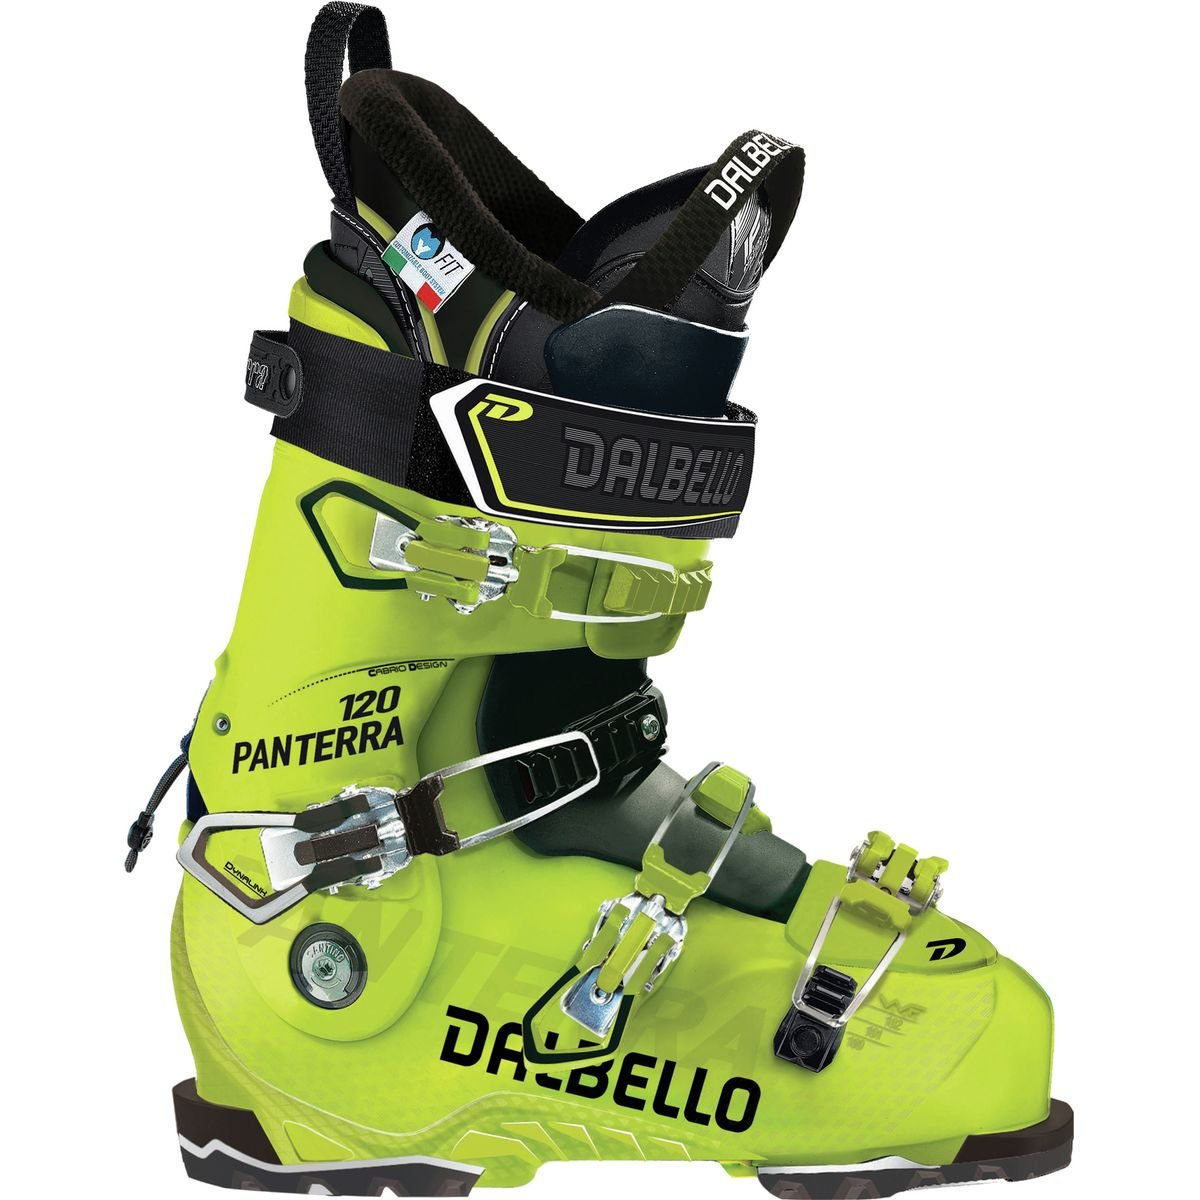 Dalbello Sports Panterra 120 I.D. Ski Boot Acid Yellow/Black, 25.5